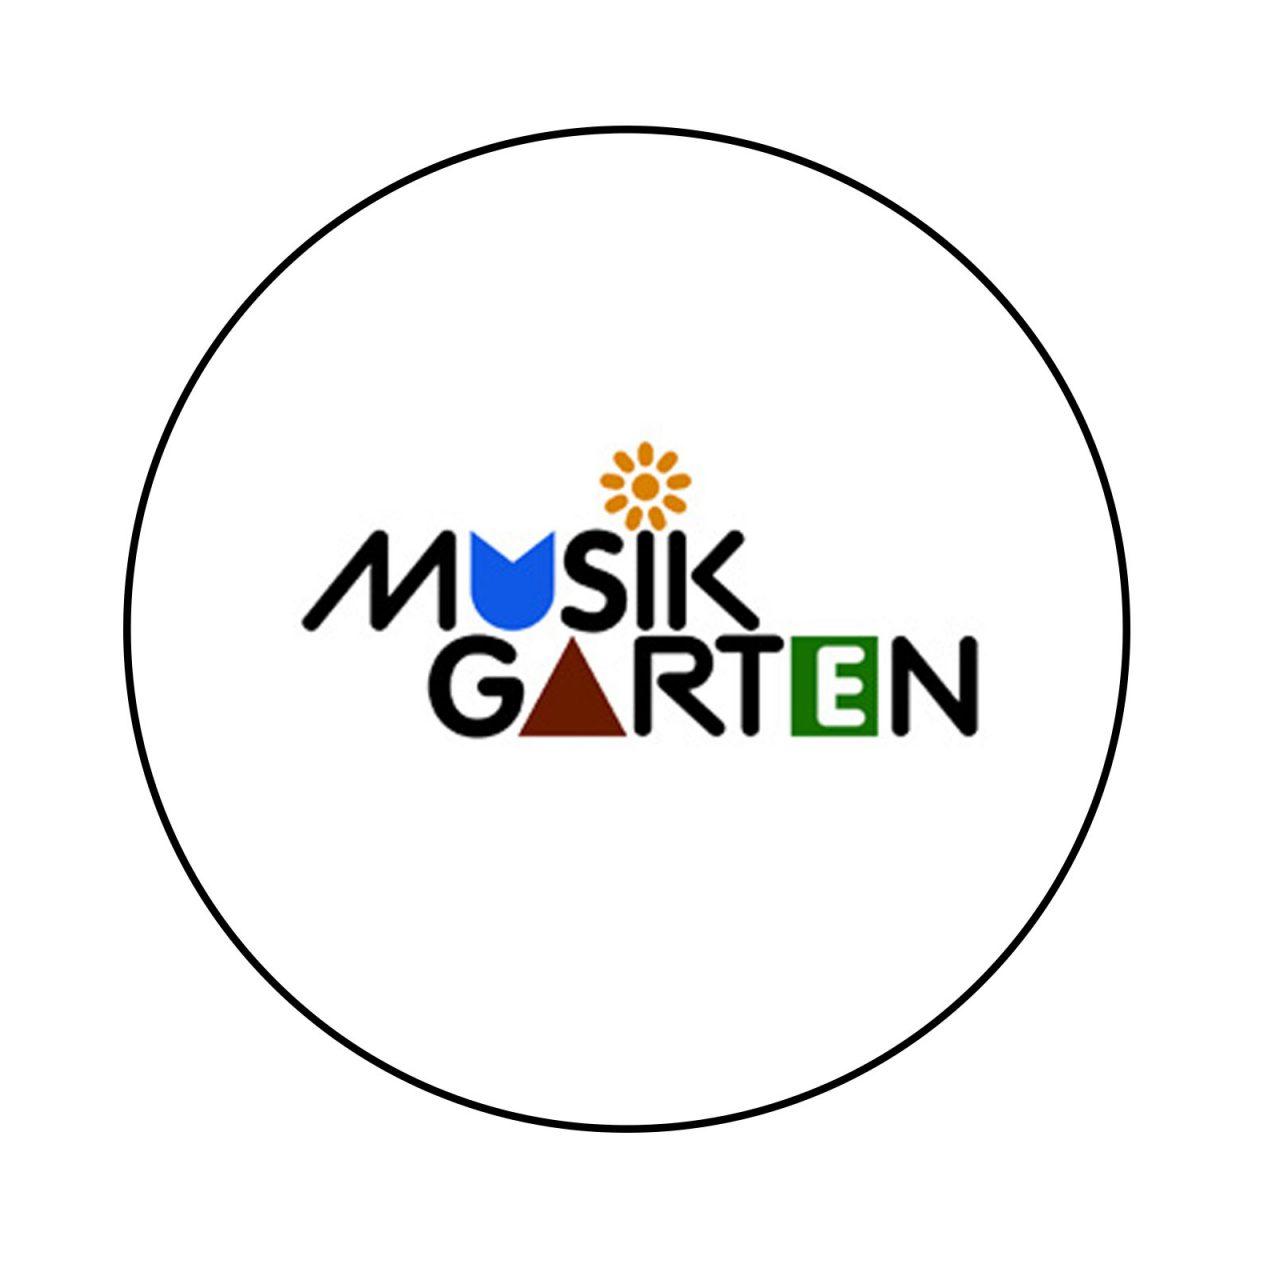 https://www.zukunfthauser.at/wp-content/uploads/2020/04/musikgarten_logo-1280x1280.jpg